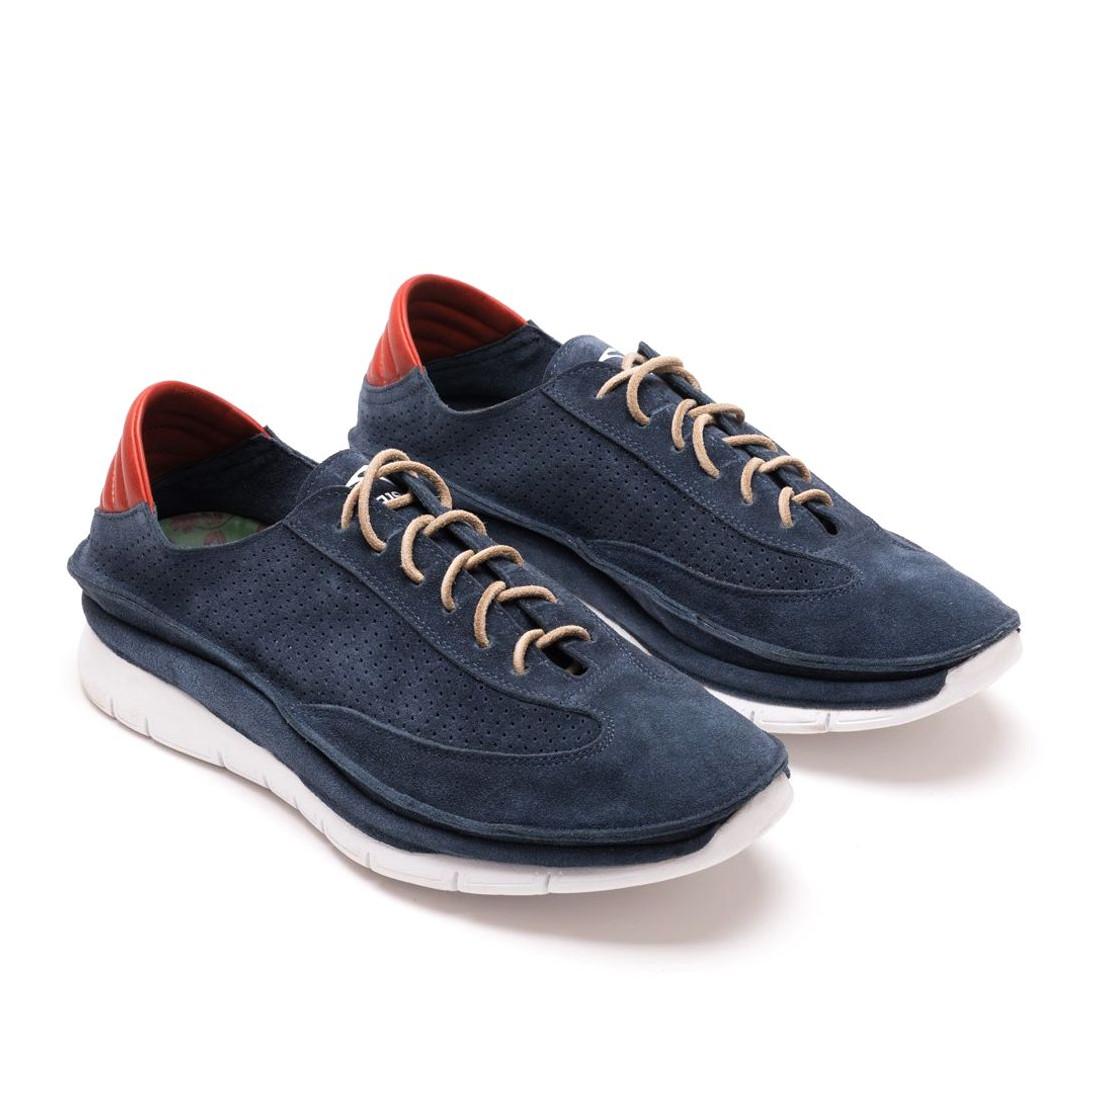 sneakers uomo calpierre pianuracawash ottanio 8424